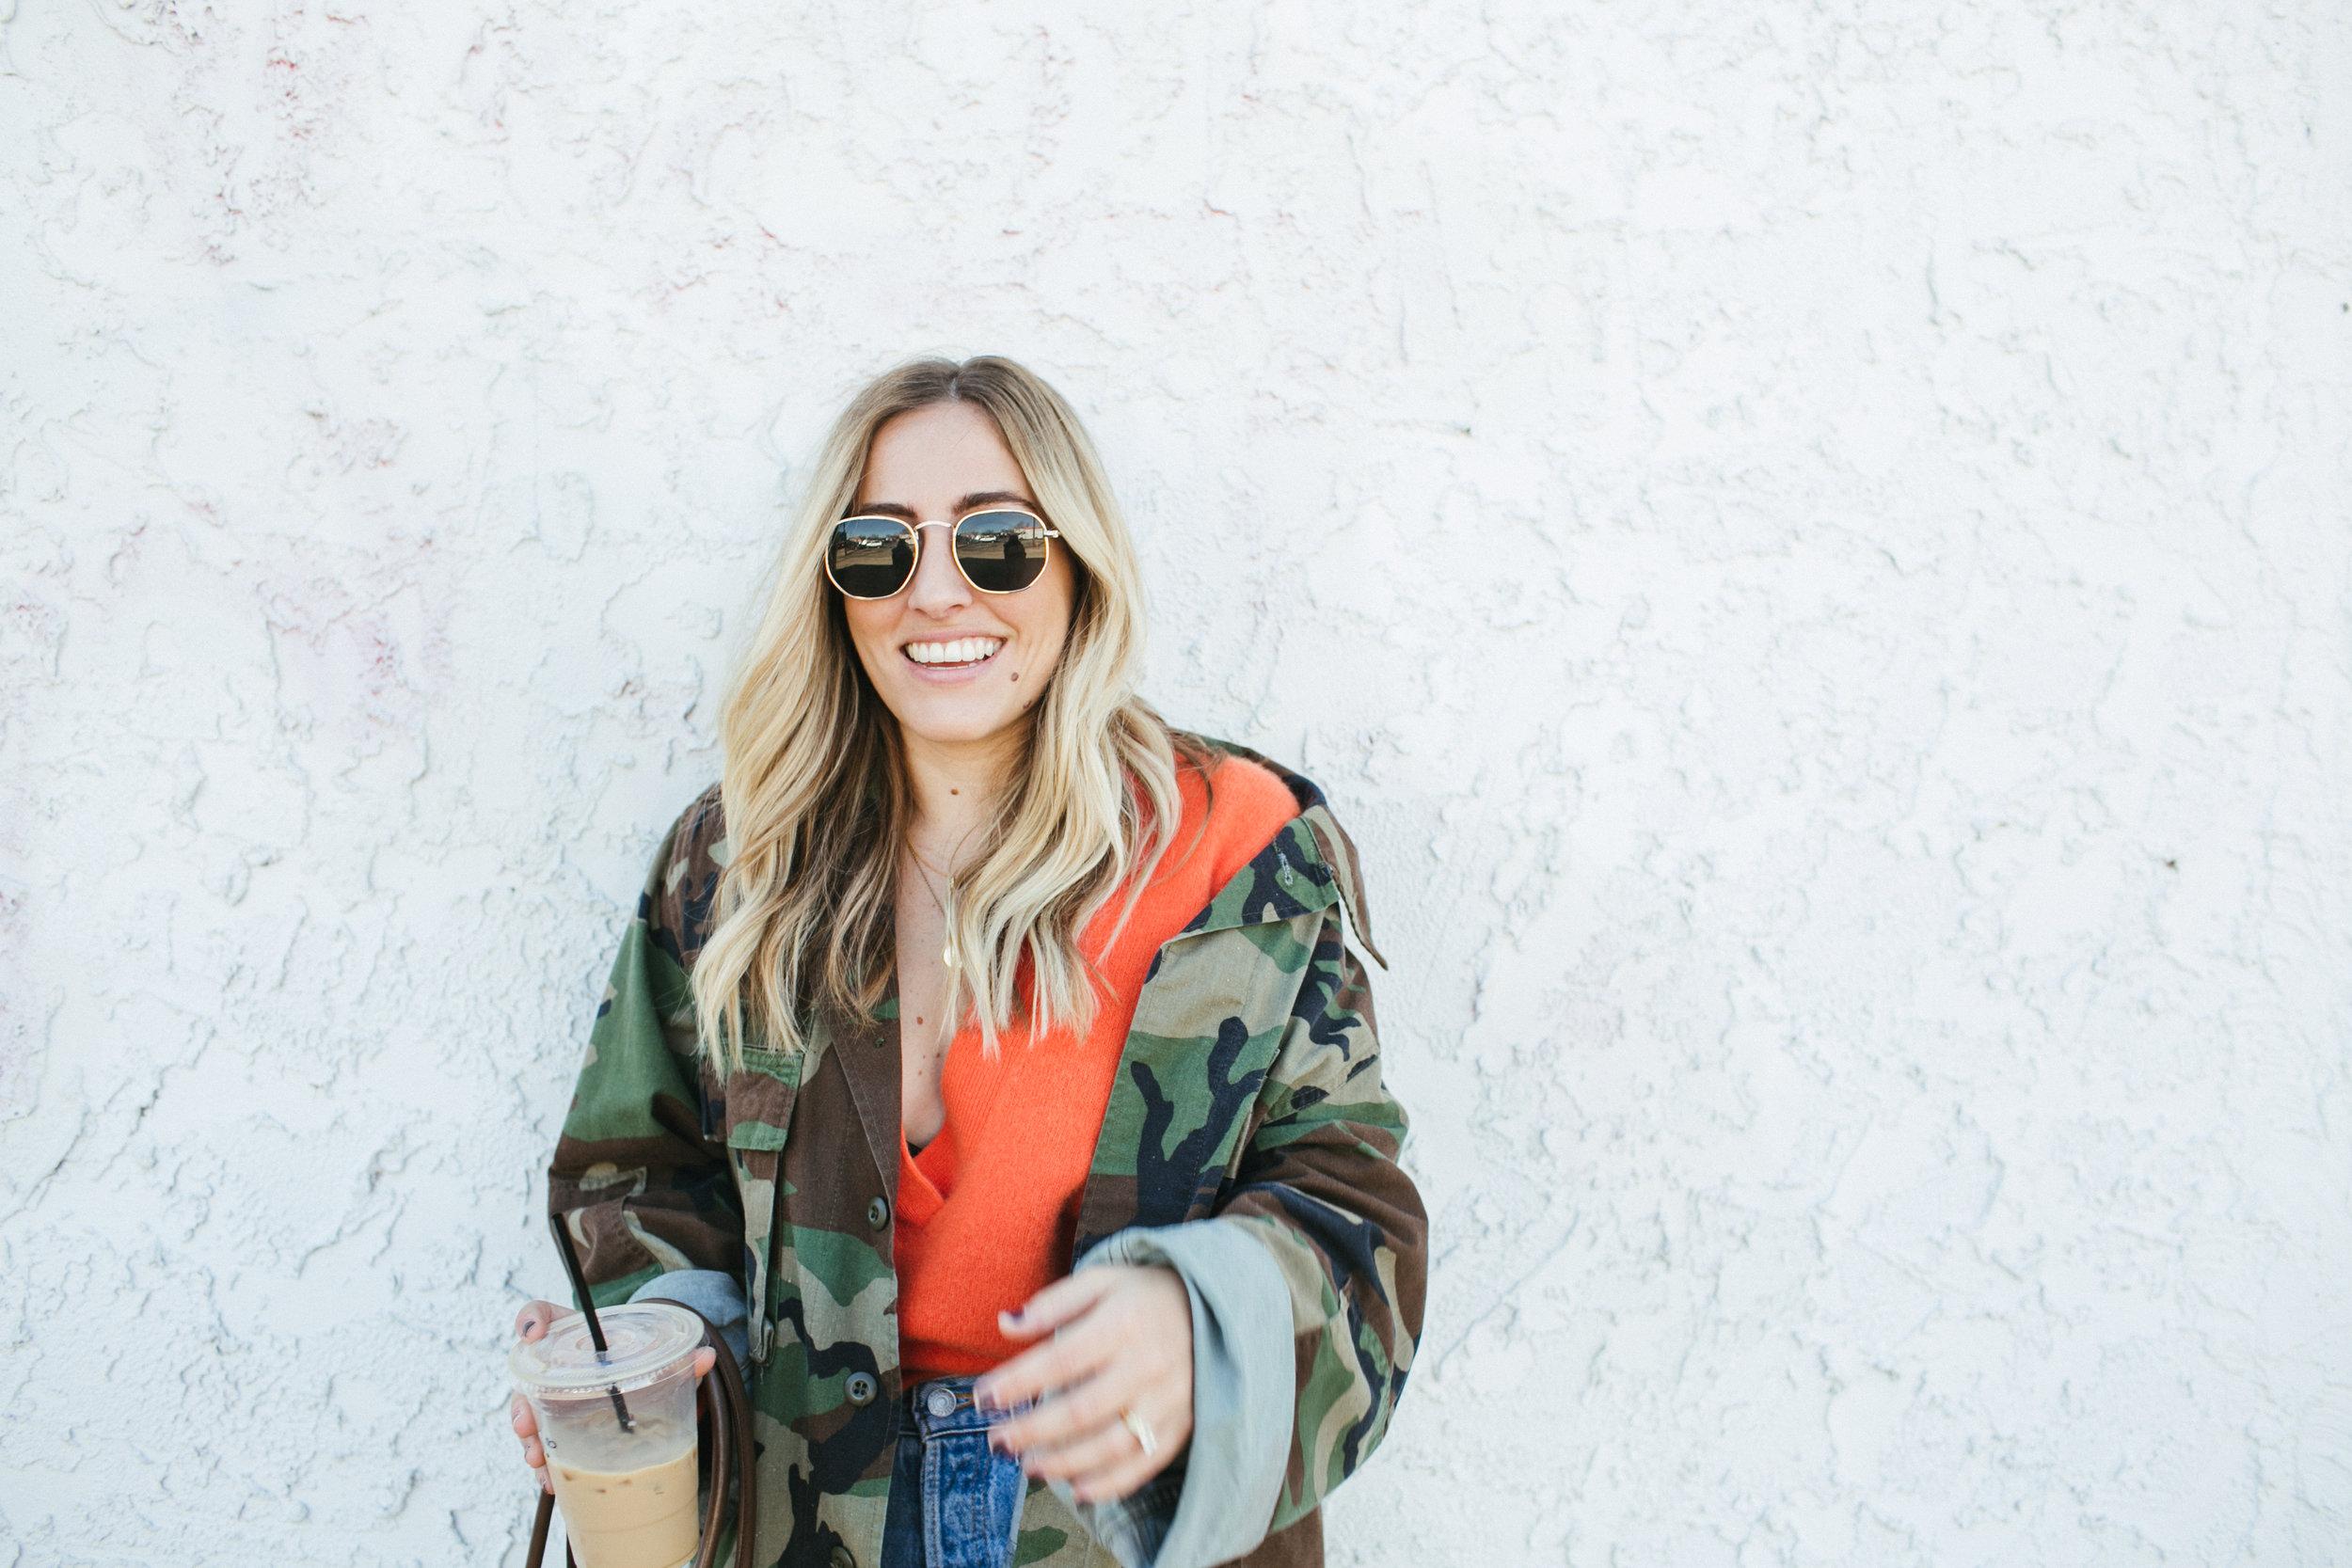 Paige-Newton-Lifestyle-Fashion-Blogger-Influencer-Photography-036.jpg